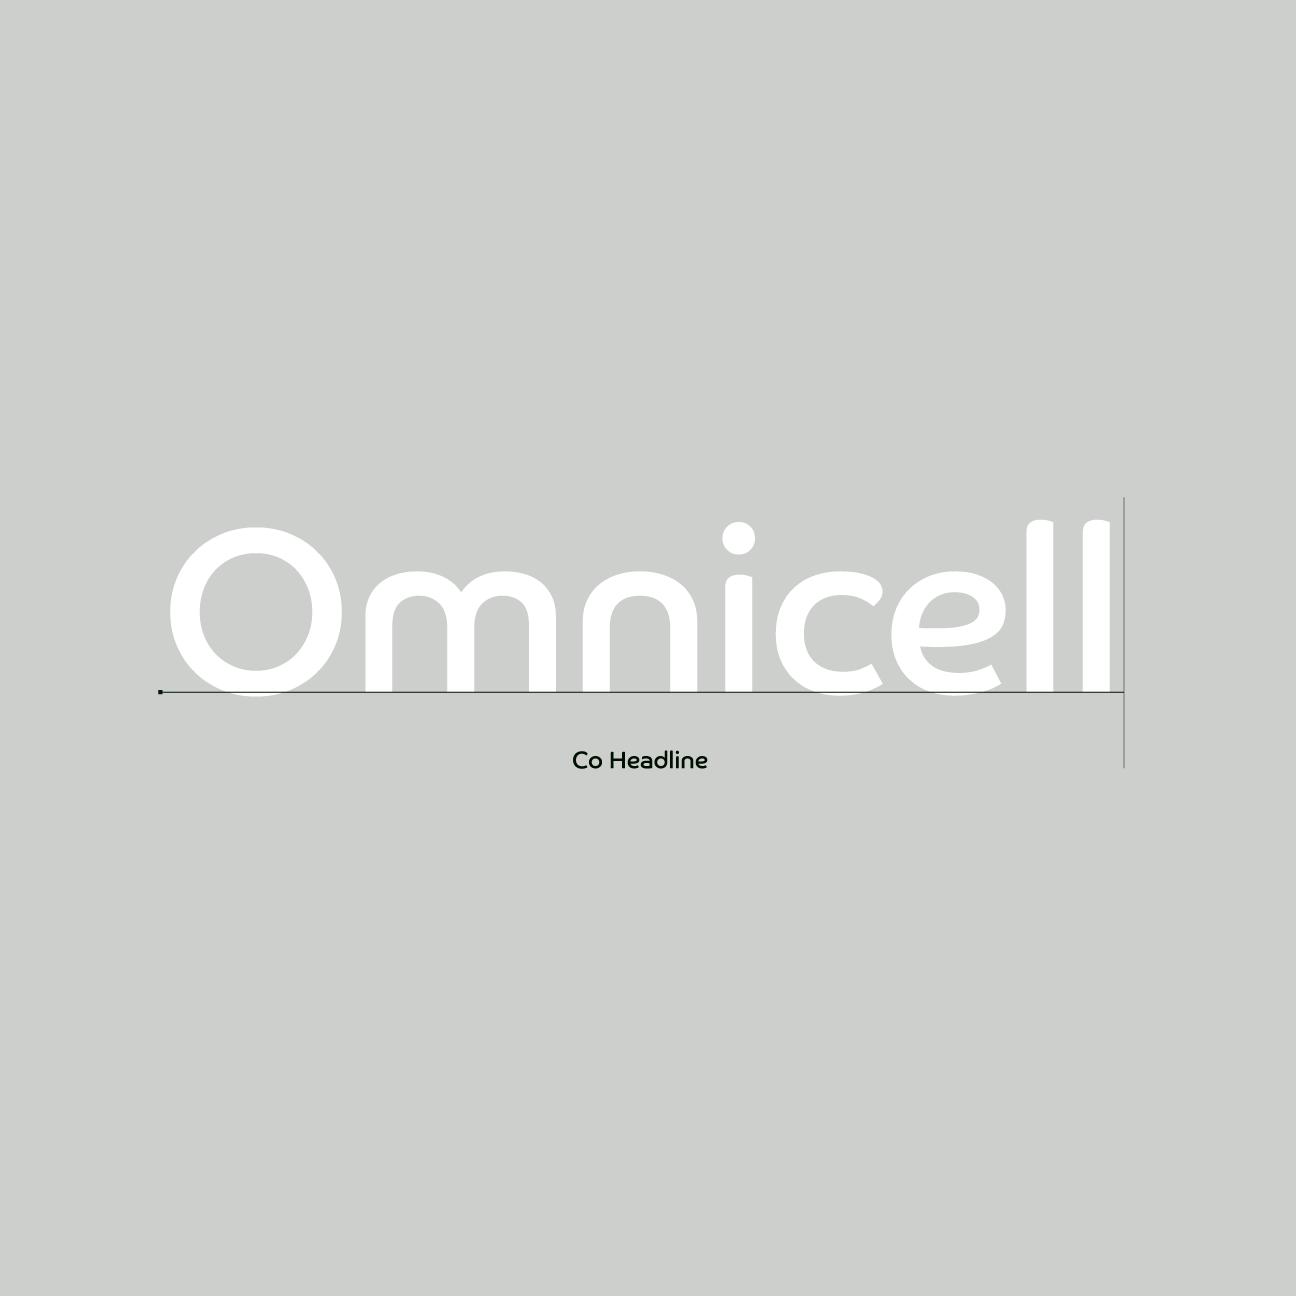 Omnicell Wordmark